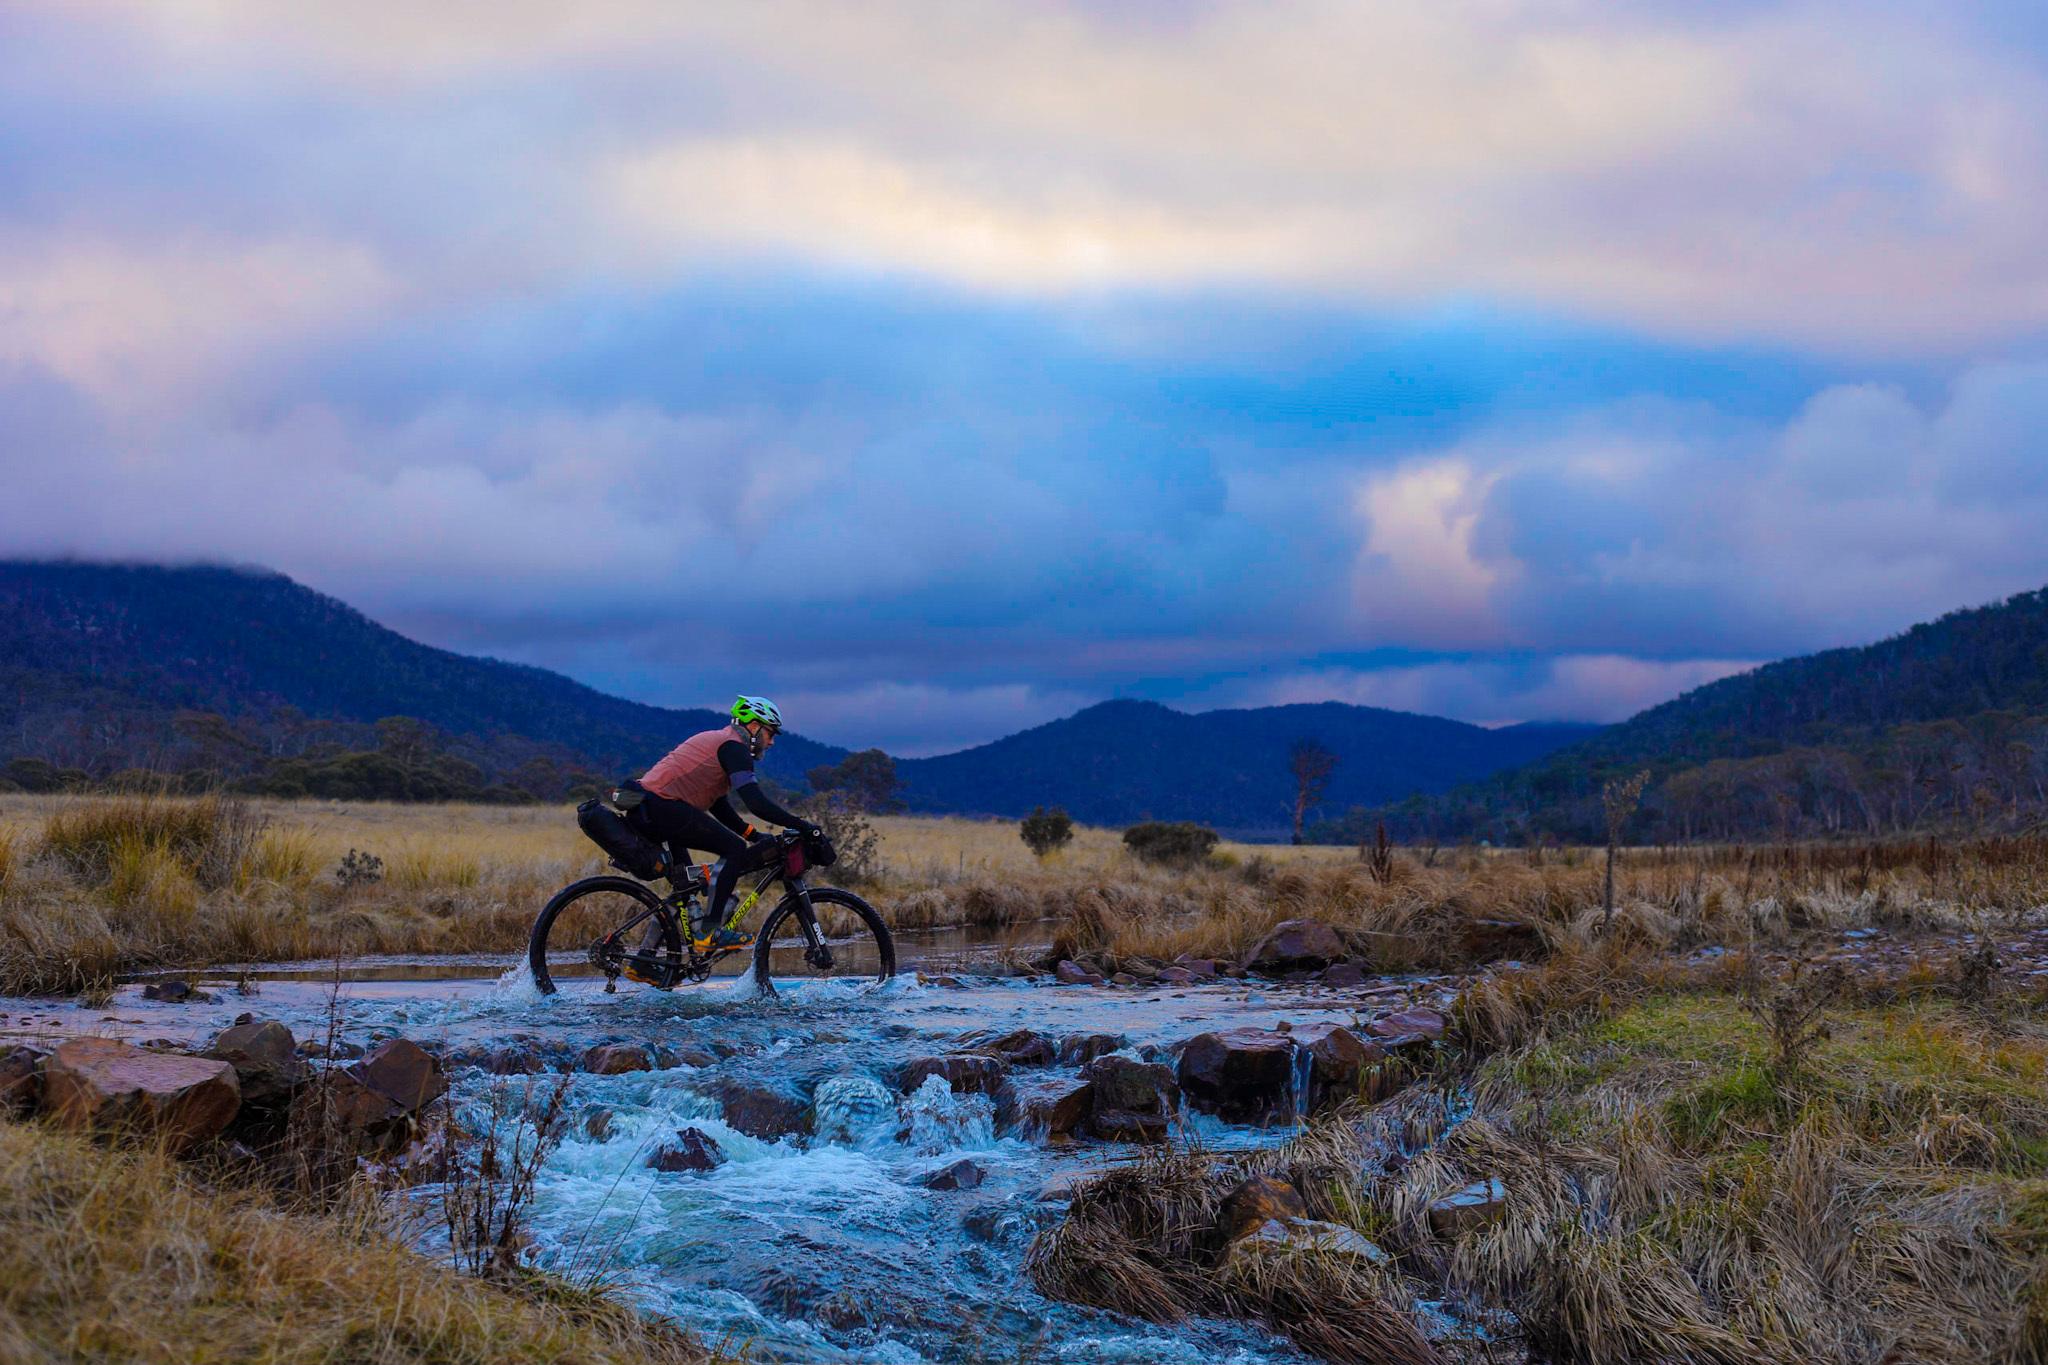 River crossing while bikepacking in Namadgi National Park